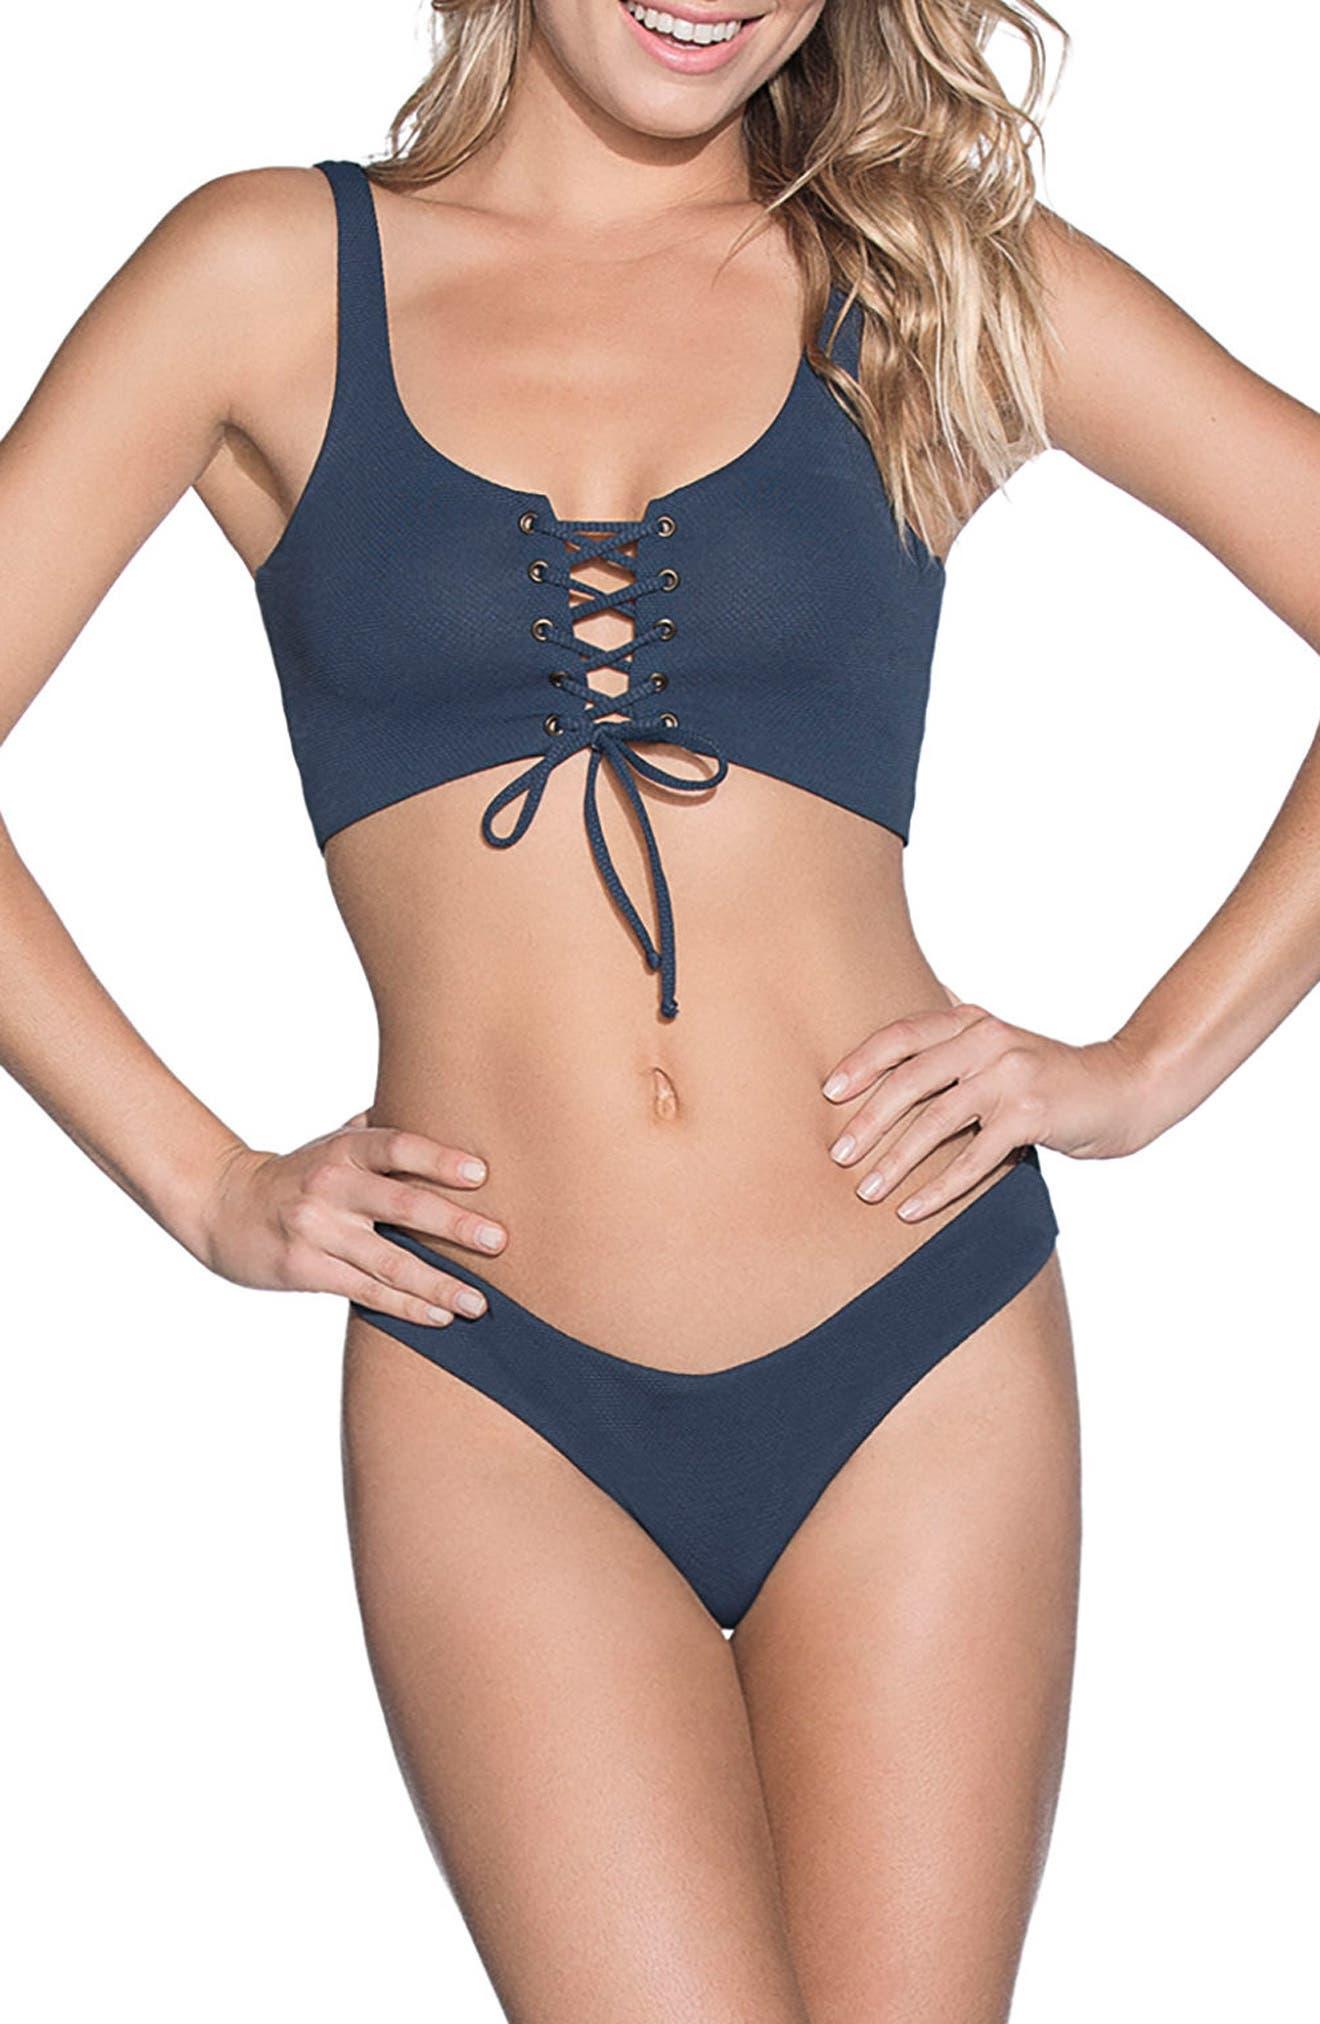 Stargazer Reversible Bikini Top,                             Alternate thumbnail 4, color,                             Heritage Blue